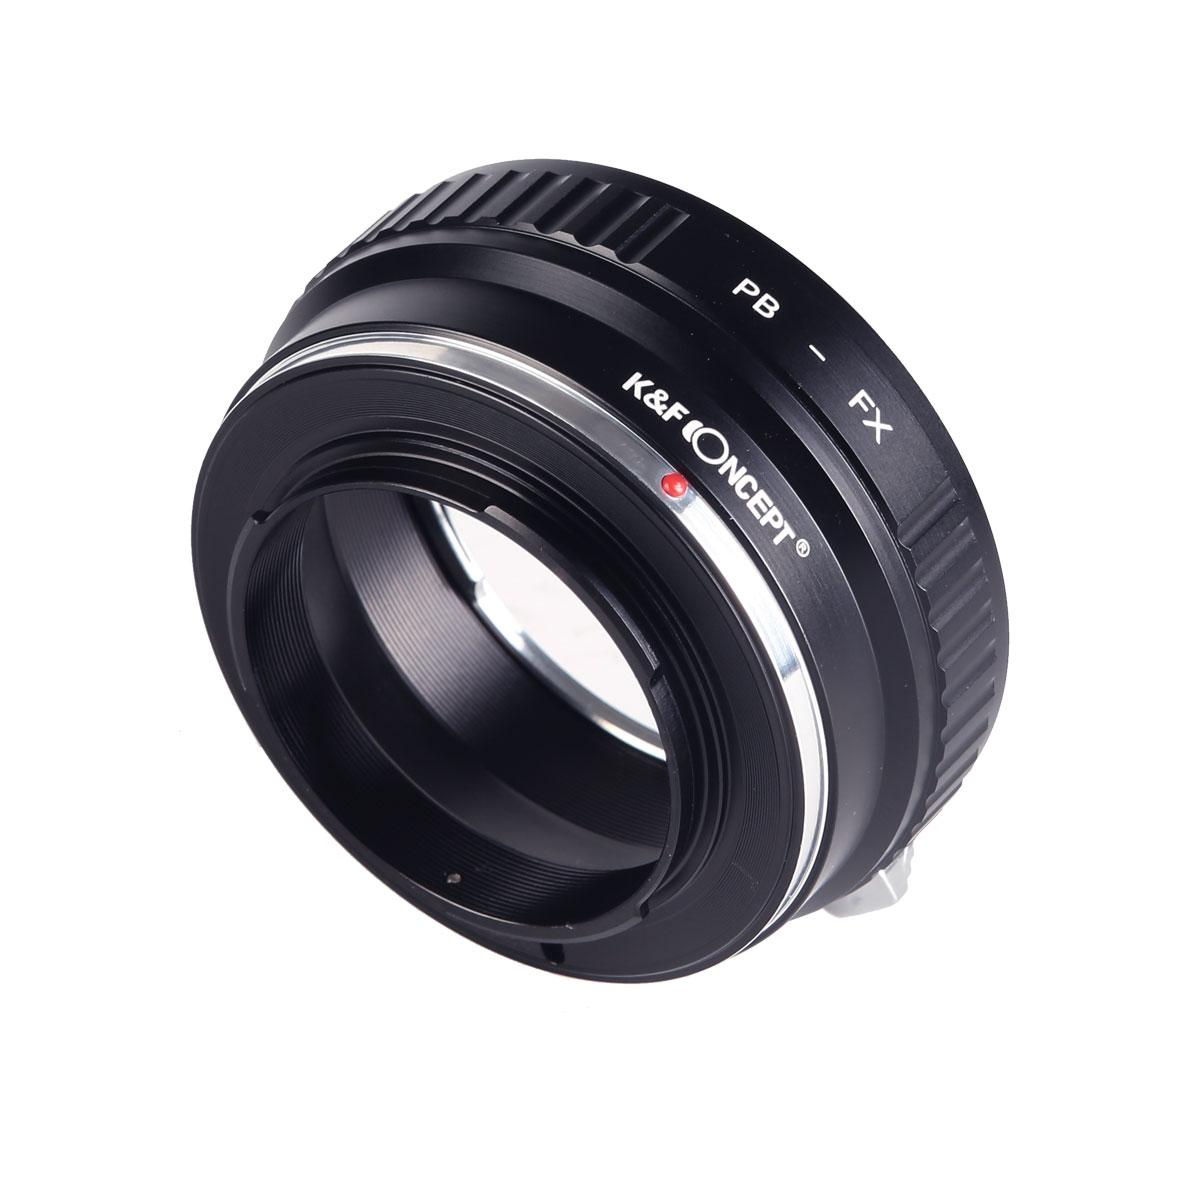 K&F M30111 Praktica B Lenses to Fuji X Lens Mount Adapter